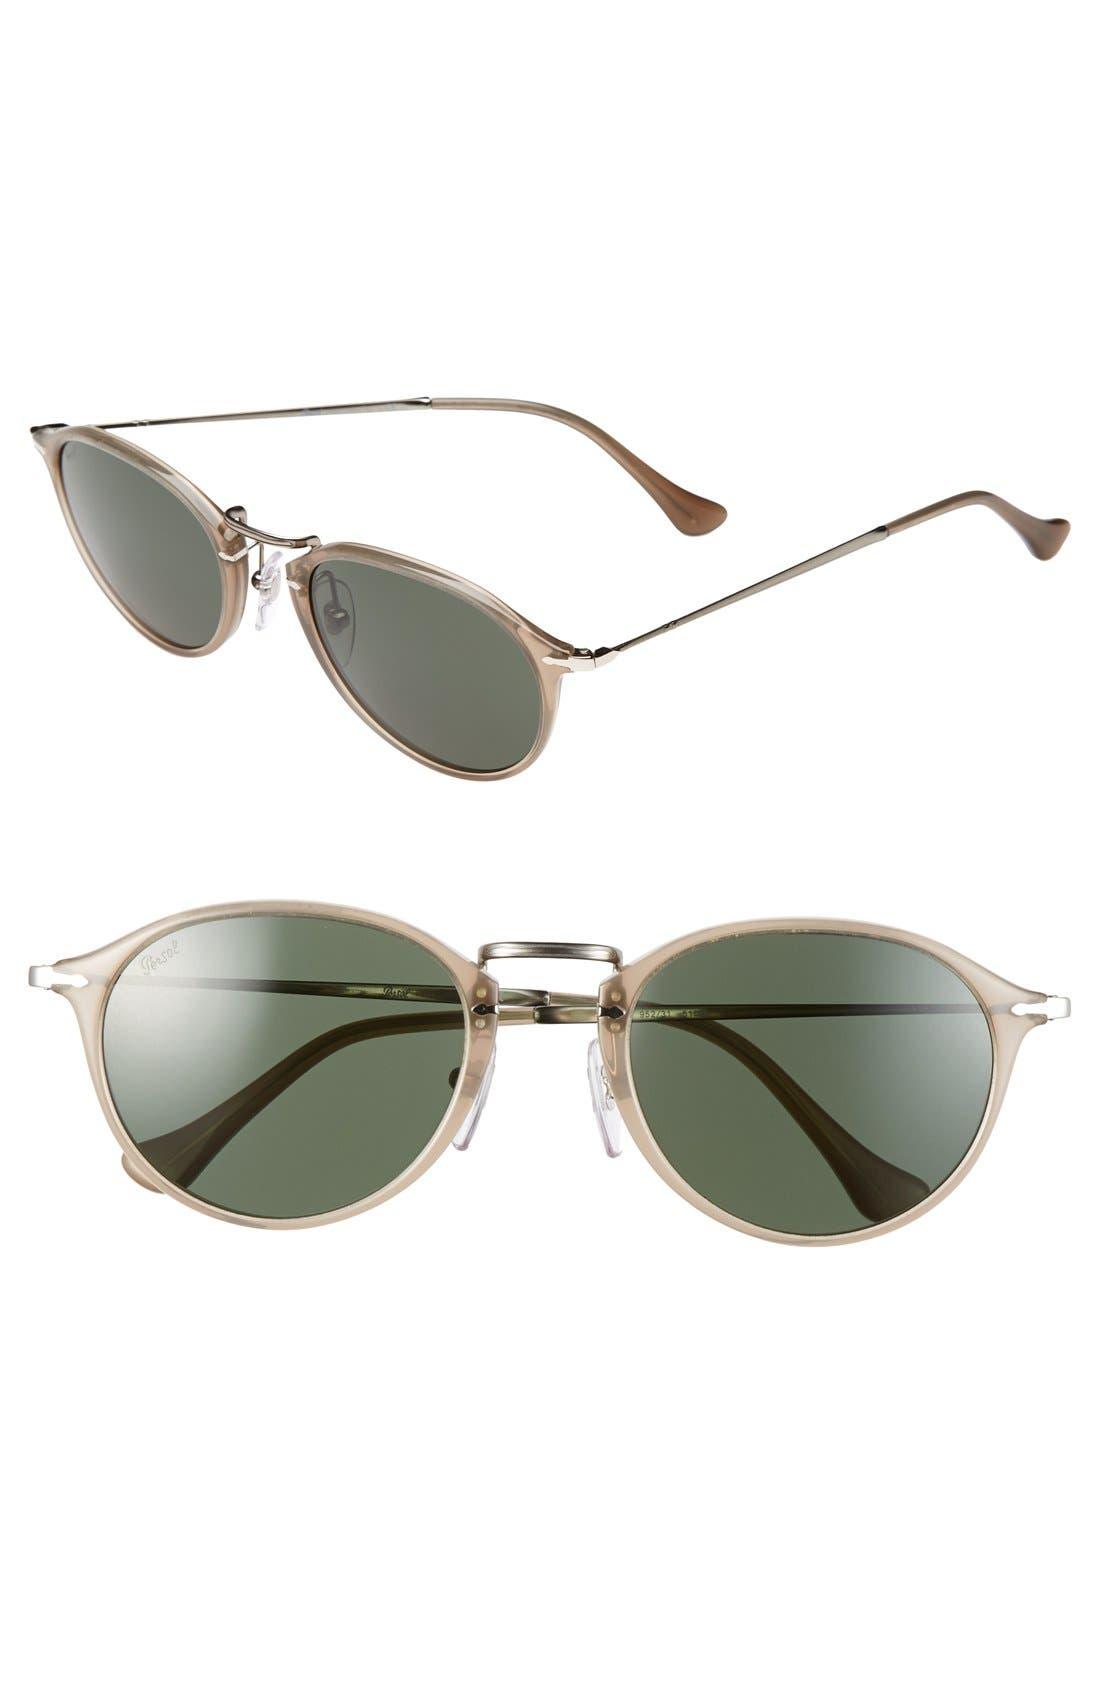 Alternate Image 1 Selected - Persol 51mm Defined Bridge Sunglasses